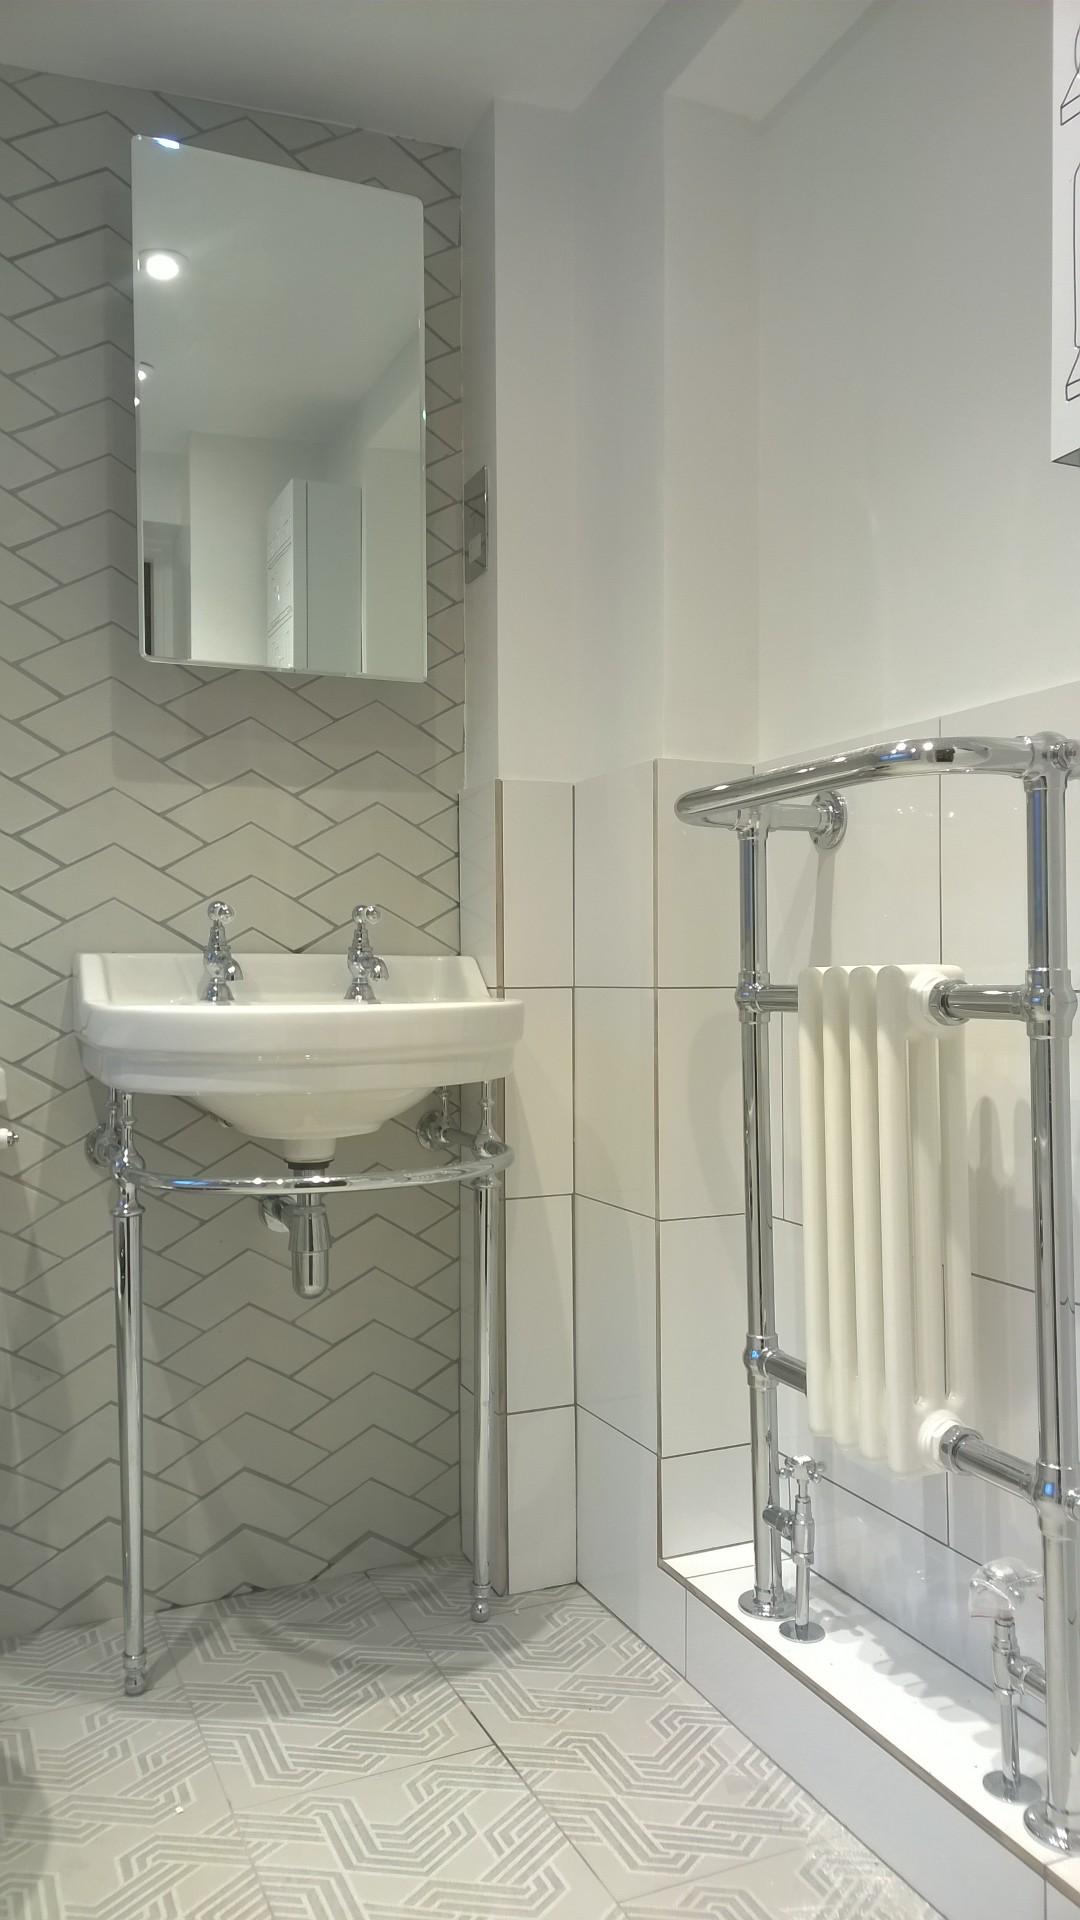 Bathroom Renovations Kingston Ontario: Richmond Bathrooms